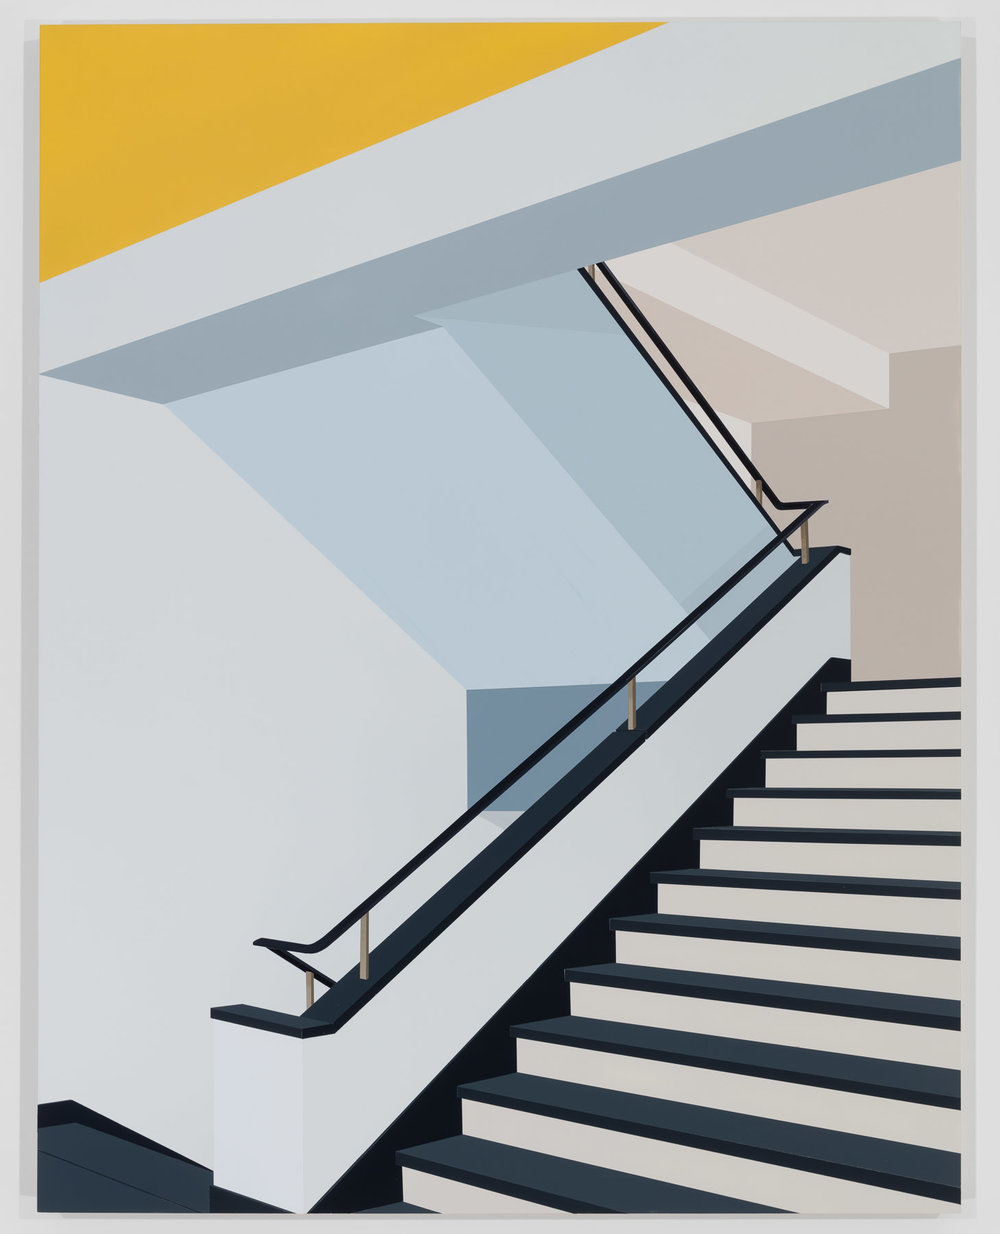 Bauhaus, Dessau, 2018 acrylic on Dibond 40 x 31 inches (101.6 x 78.7 cm)